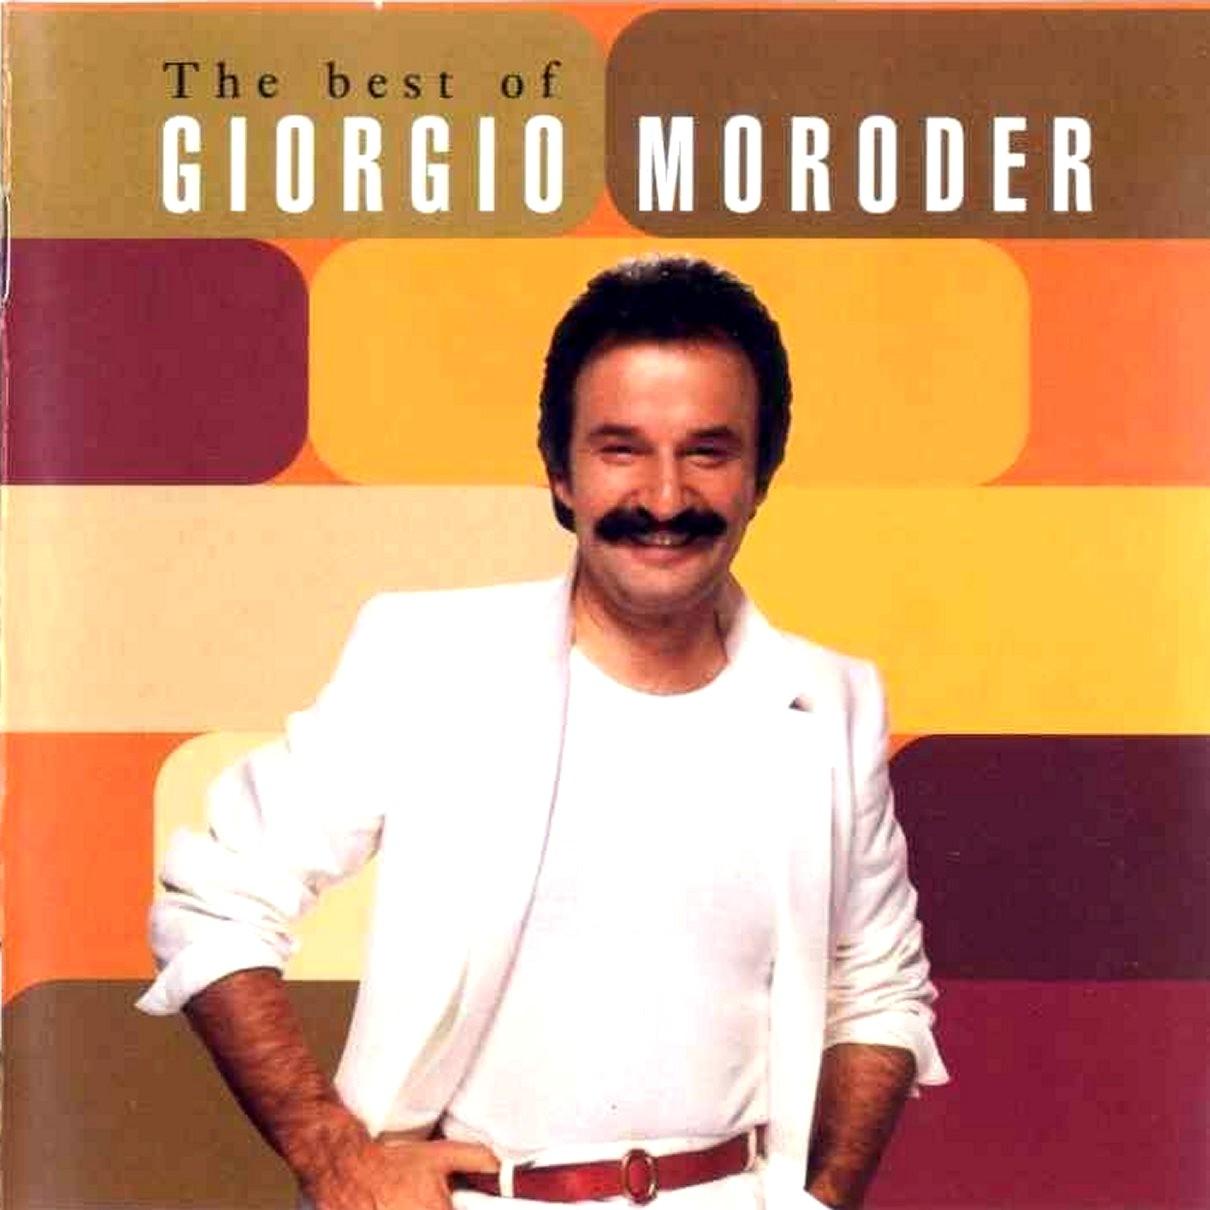 Paul Engemann Giorgio Moroder Scarface Push It To The Limit Theme From Scarface Tonys Theme